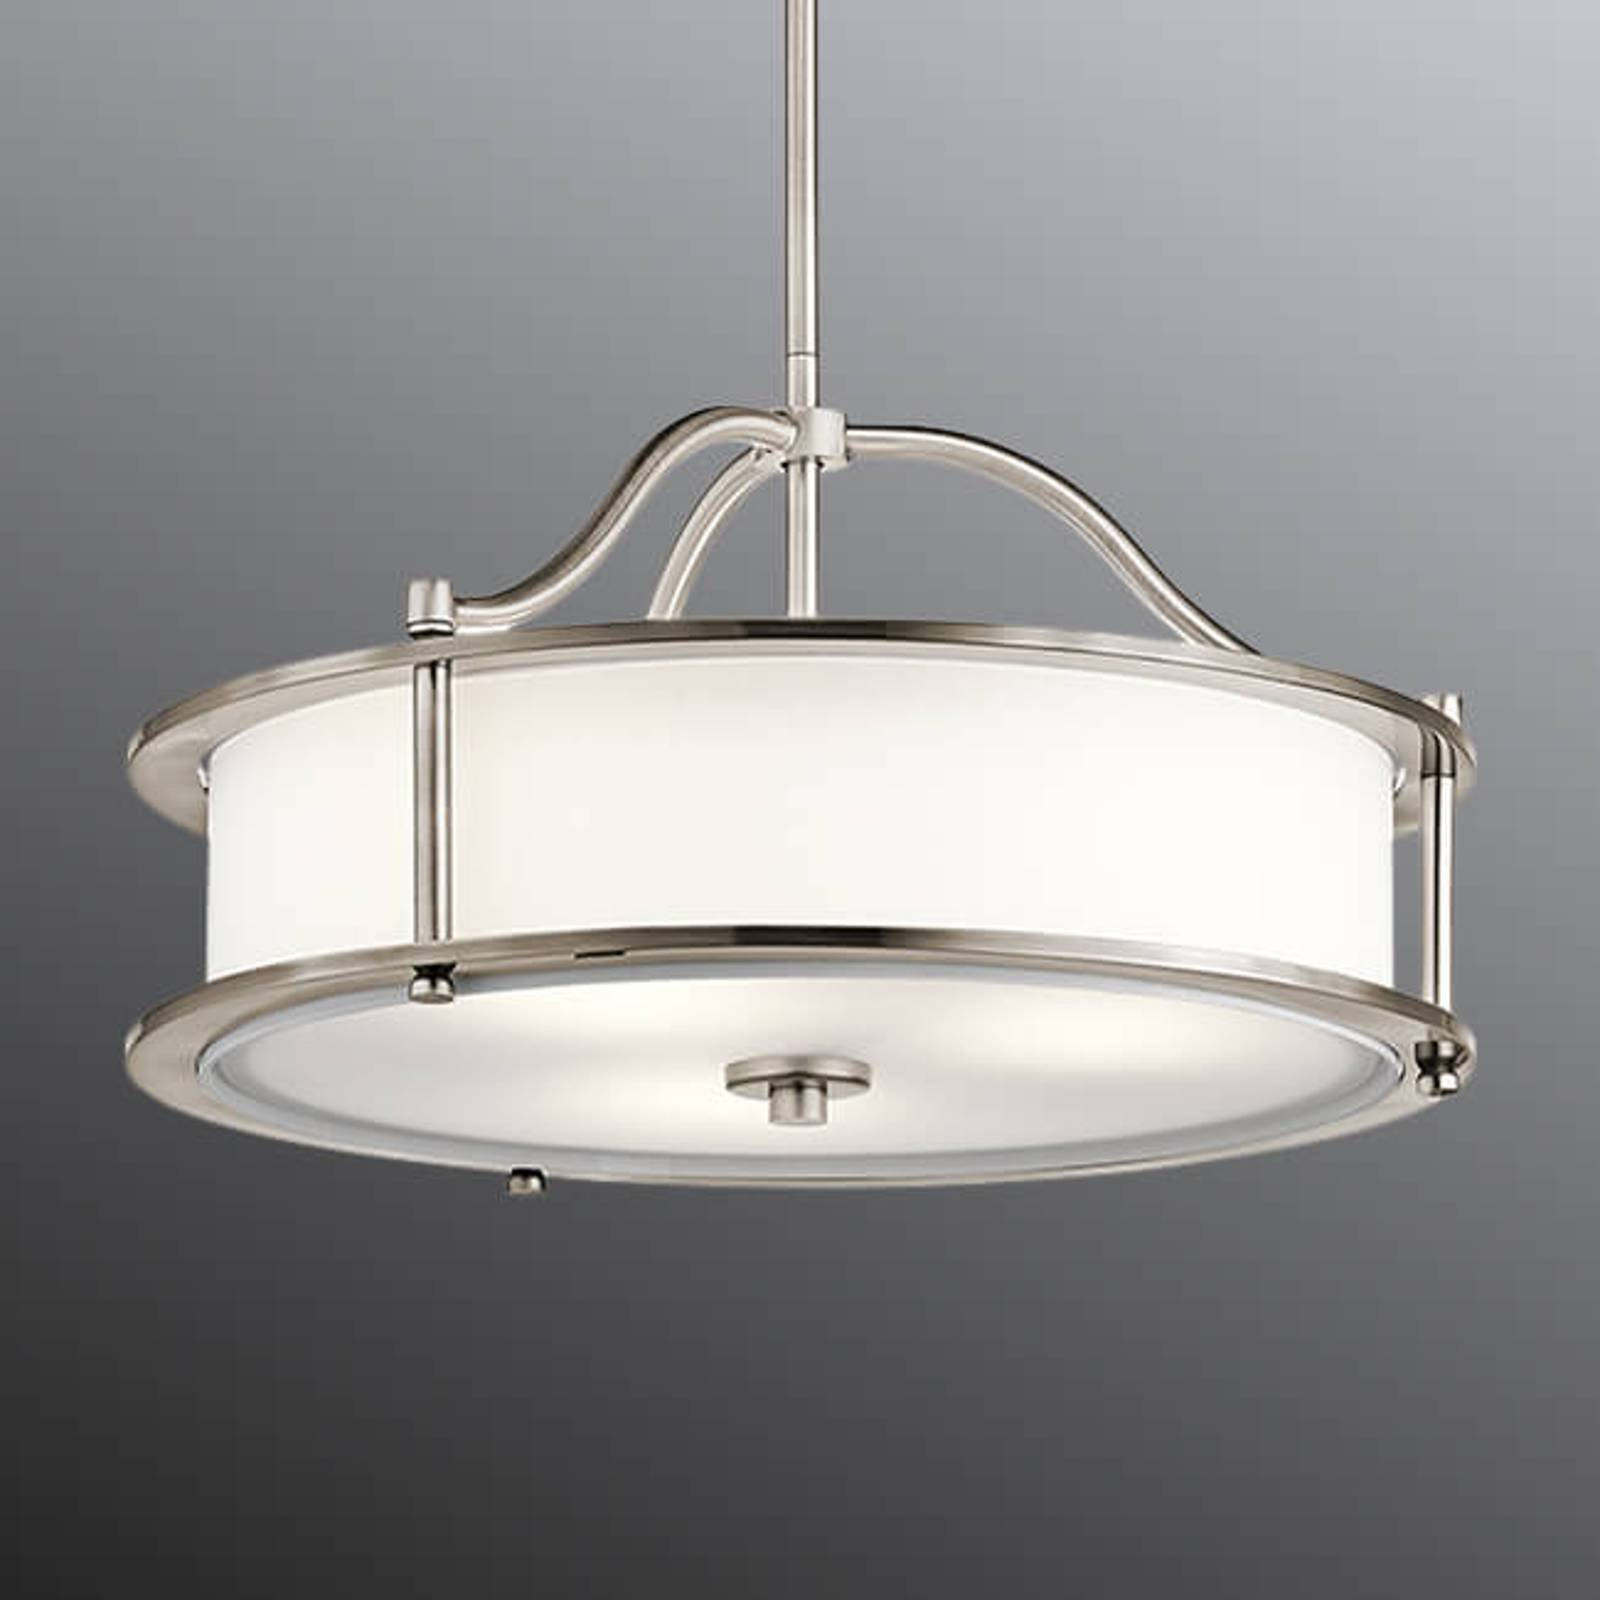 Designet hengelampe Emory, Ø 45,7 cm